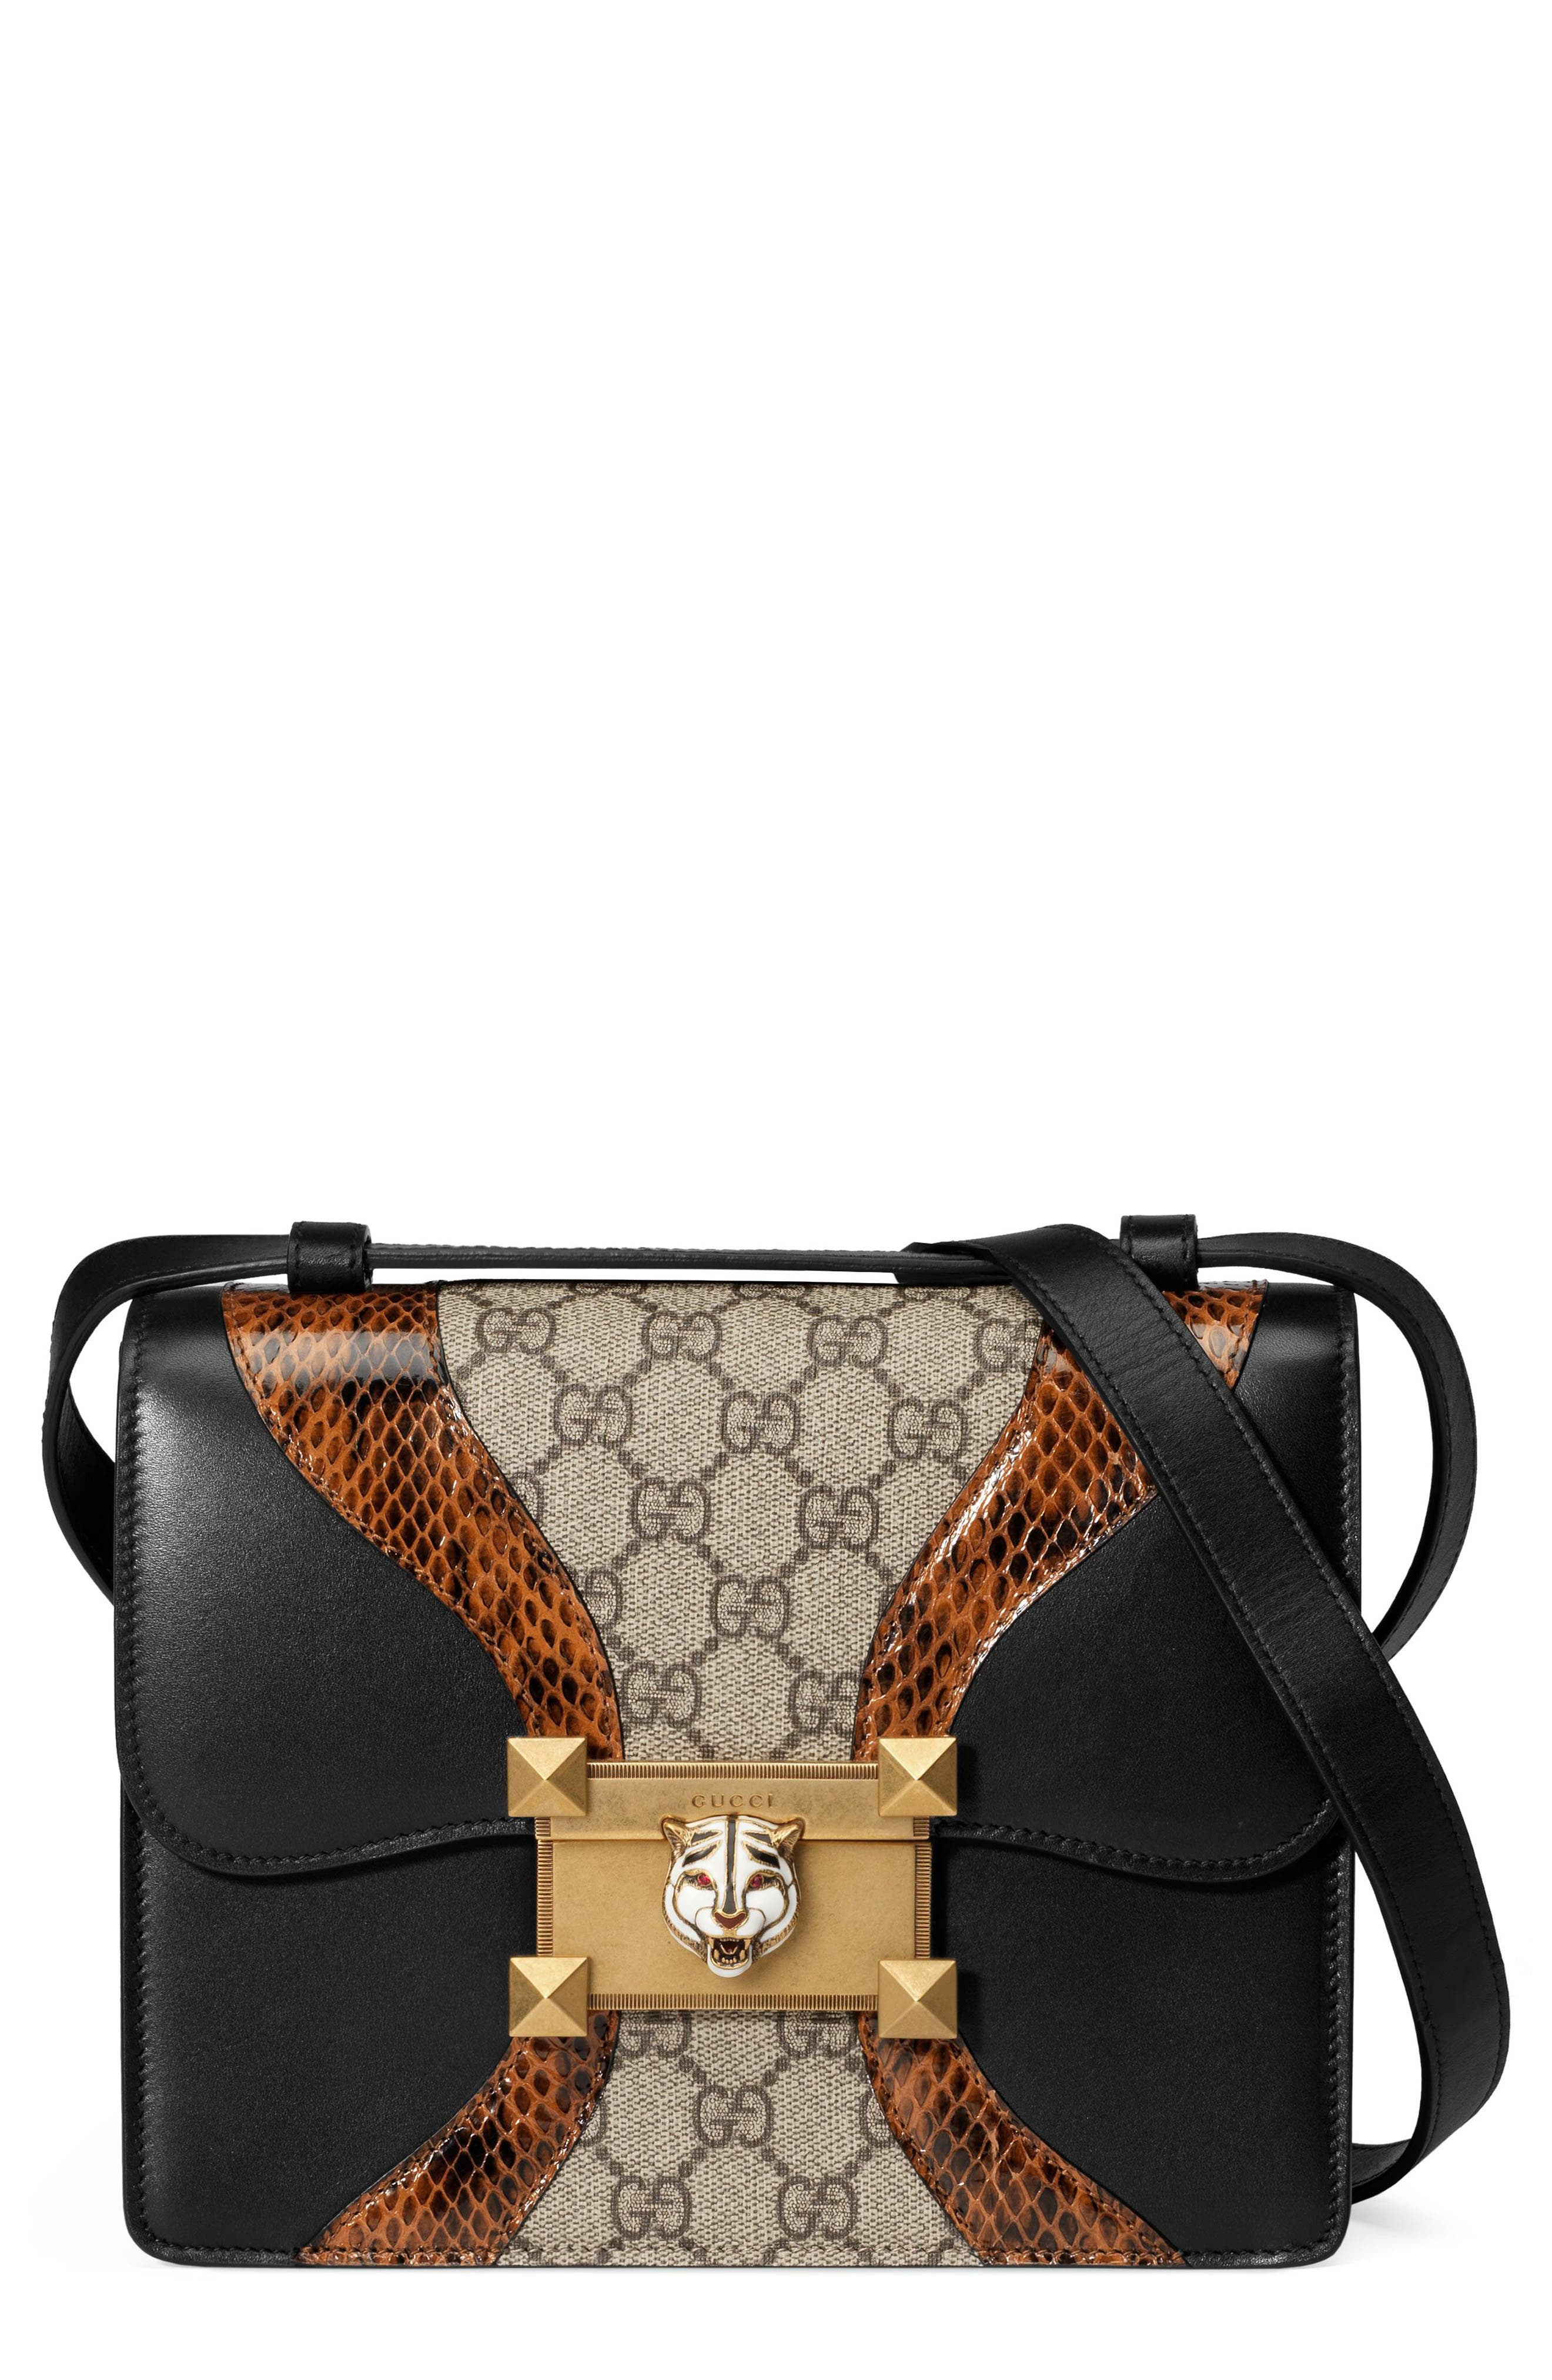 Osiride Genuine Snakeskin & GG Supreme Shoulder Bag,                             Main thumbnail 1, color,                             Nero/ Cuir/ Beige Ebony/ Ruby